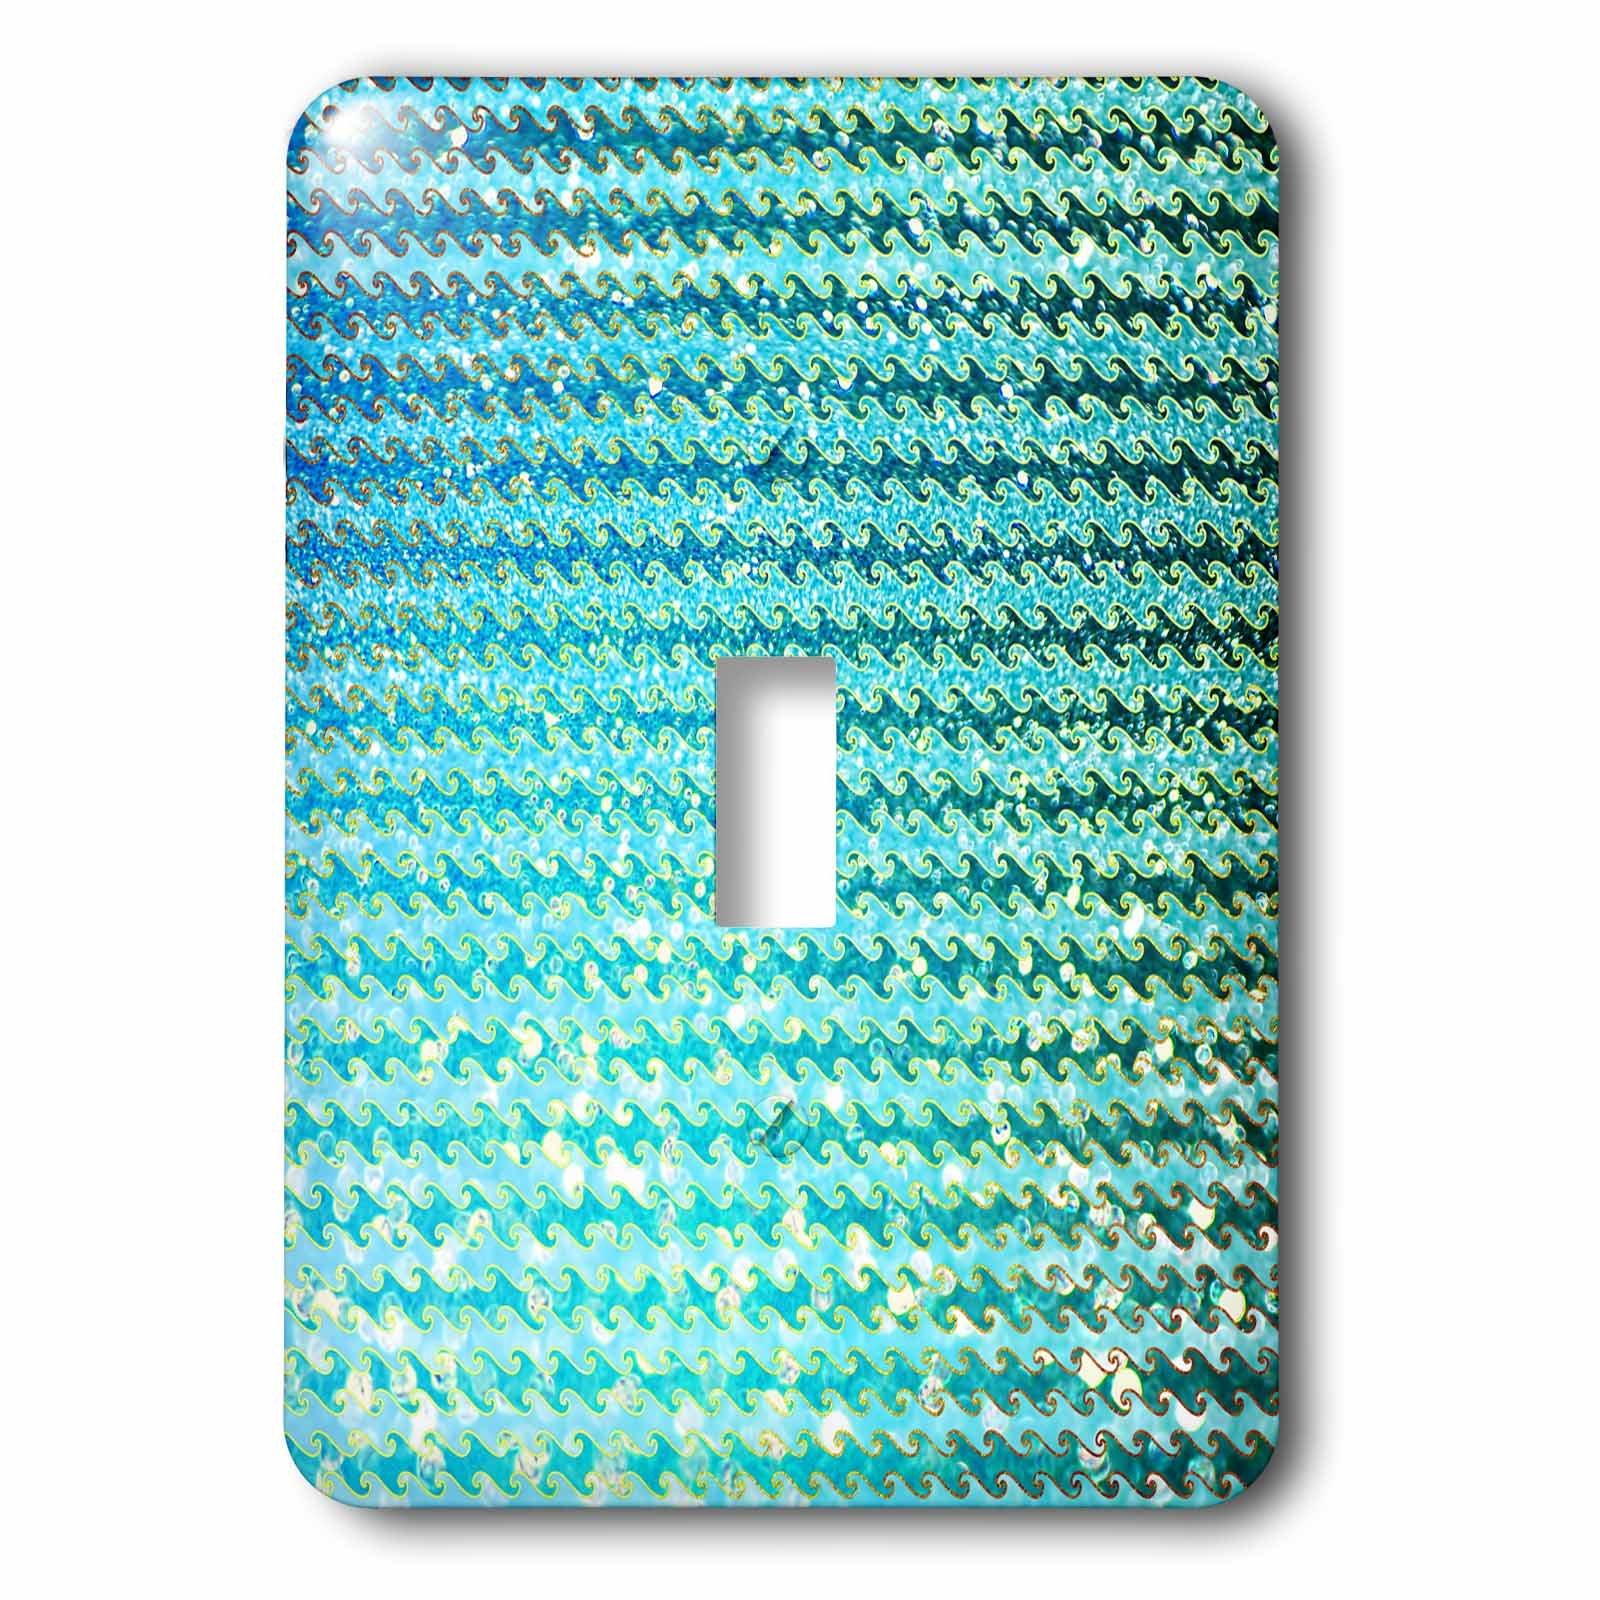 3dRose Uta Naumann Faux Glitter Pattern - Sparkling Teal Luxury Elegant Mermaid Sea Ocean Waves - Light Switch Covers - single toggle switch (lsp_272858_1)